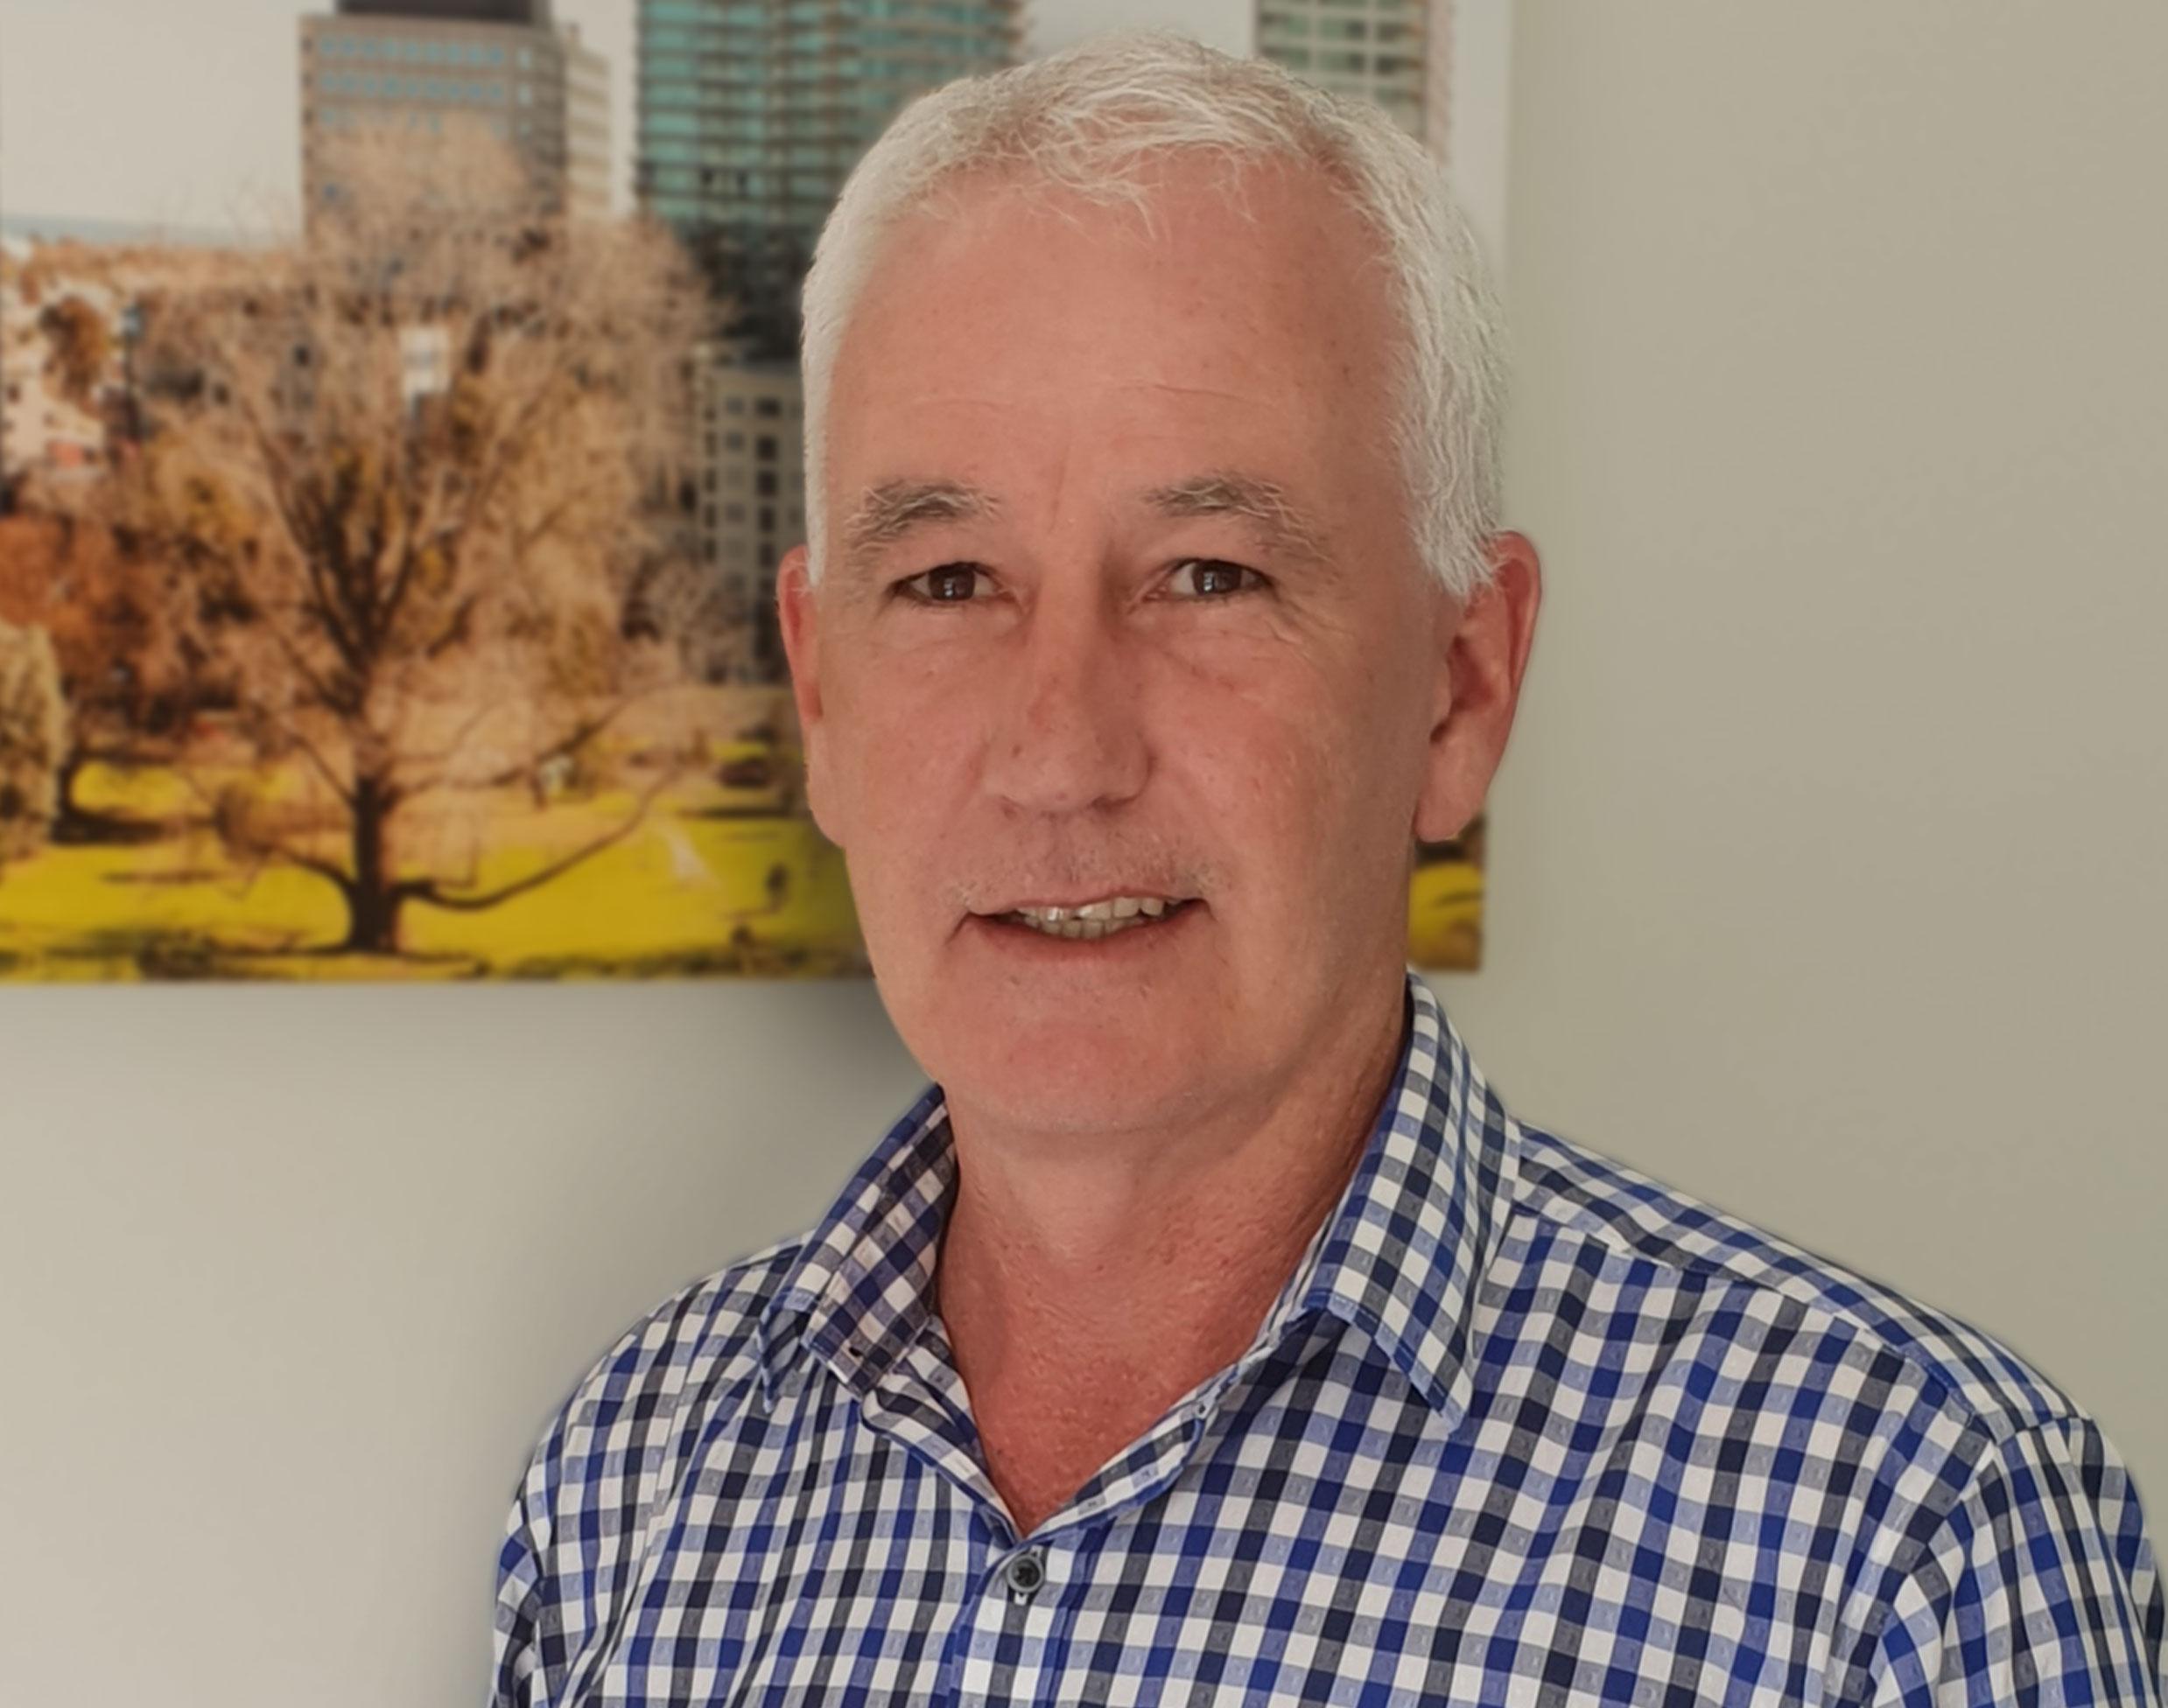 VBCS senior business development manager Greg Cates.